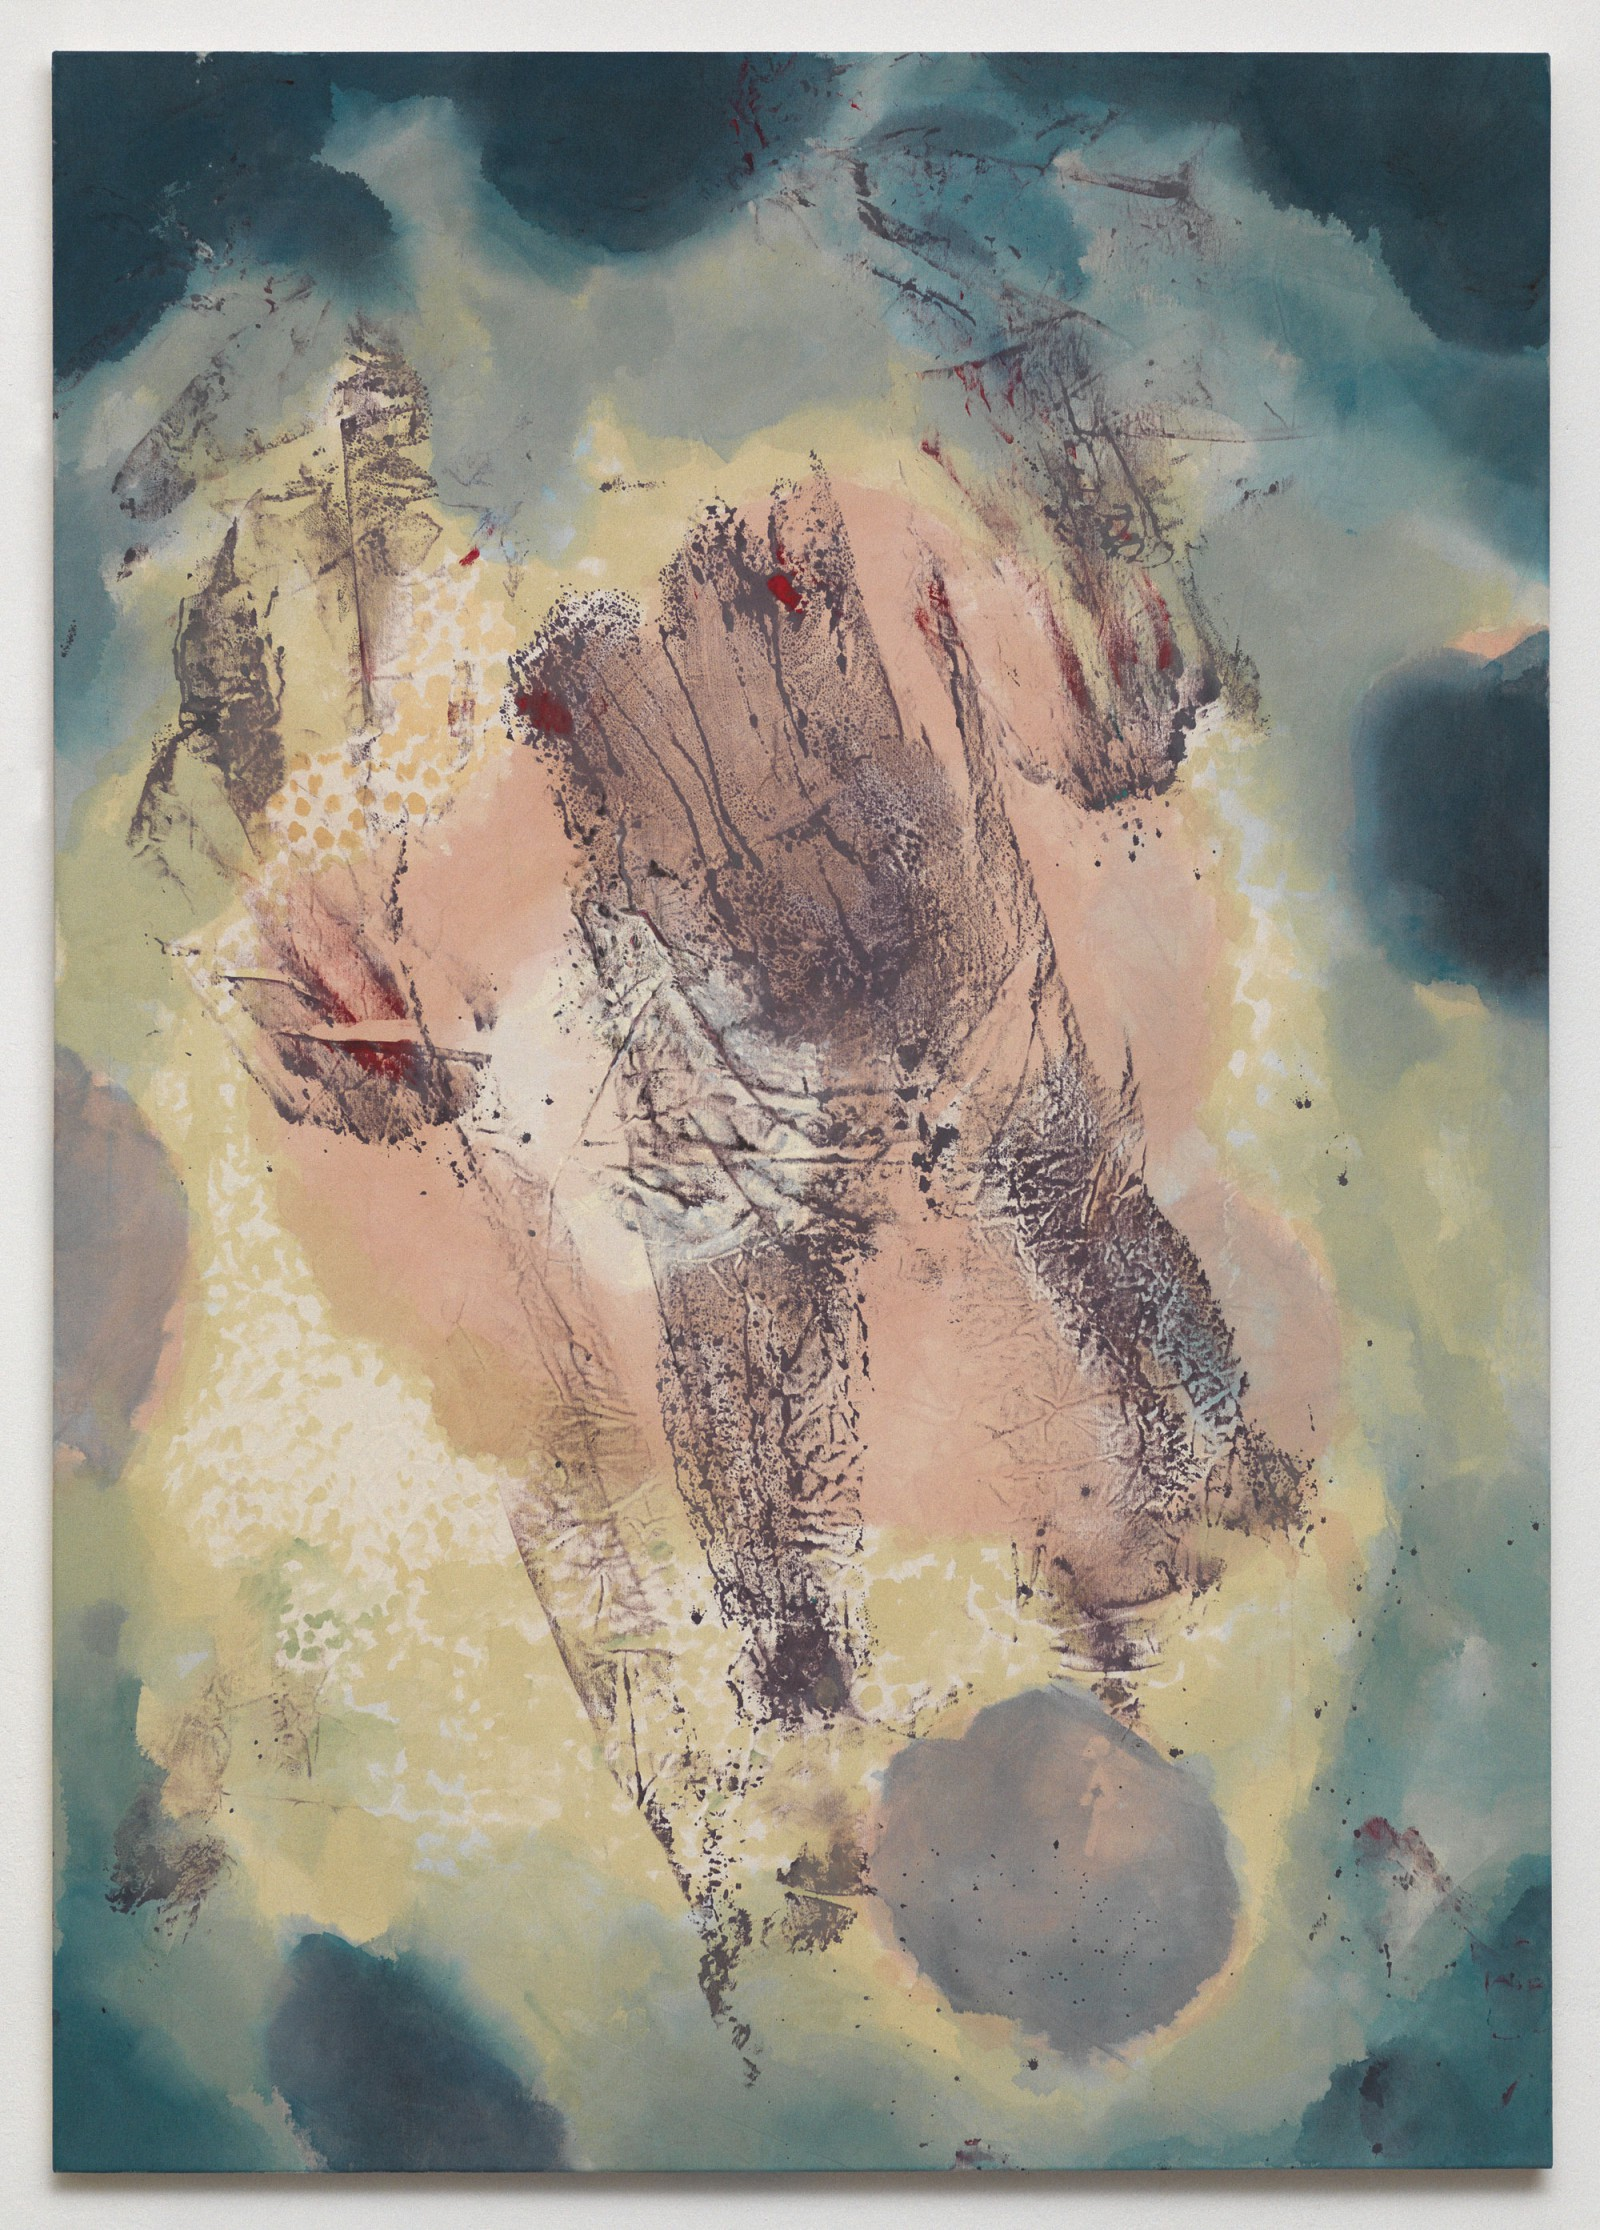 Kim Nekarda: el nino, 2012, vinyl color & body print on cotton, 170 x 120 cm